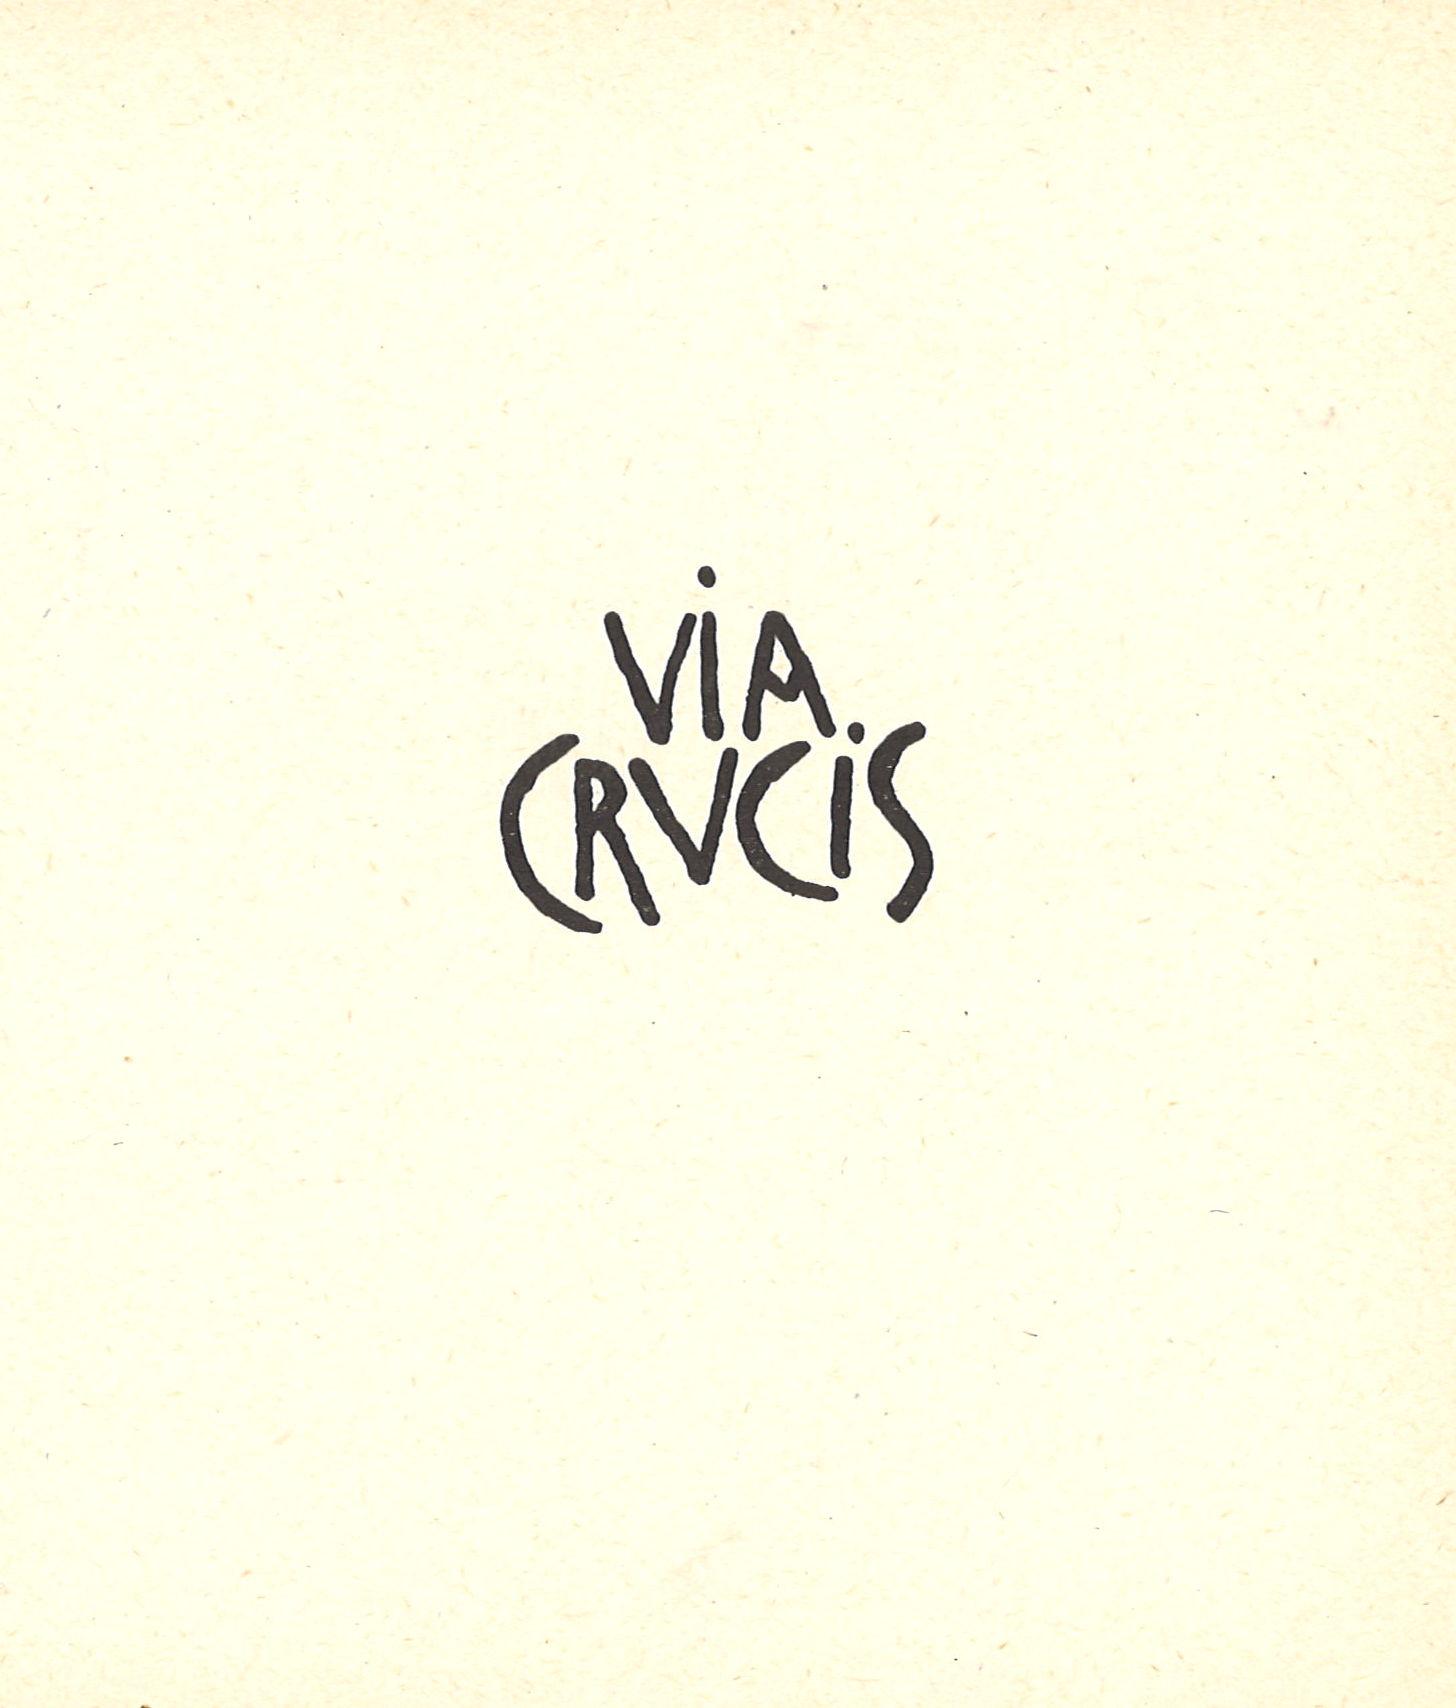 Via Crucis, Geneviève Gallois